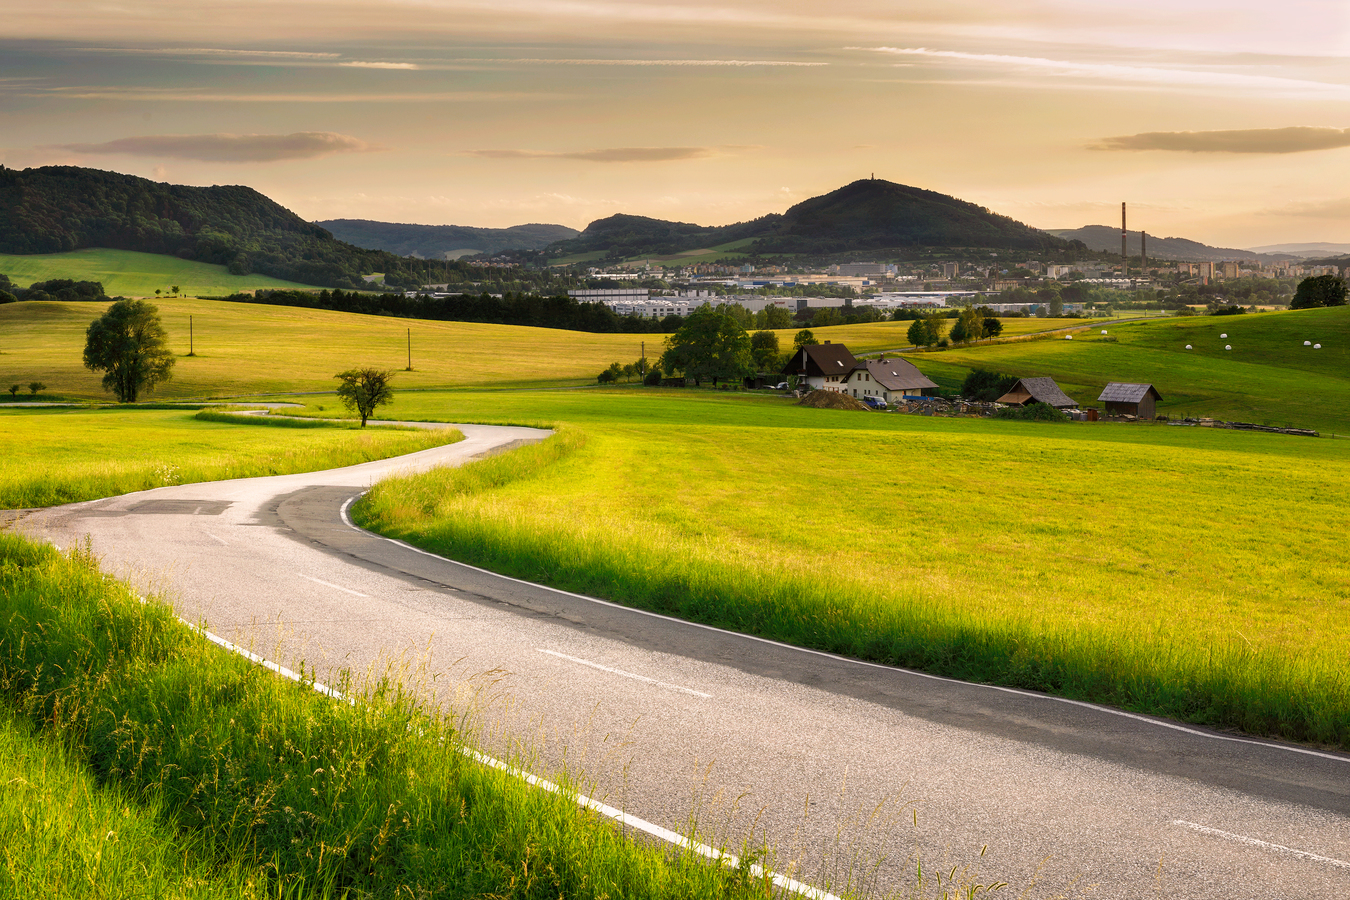 Cesta z Hukvald na Kopřivnici